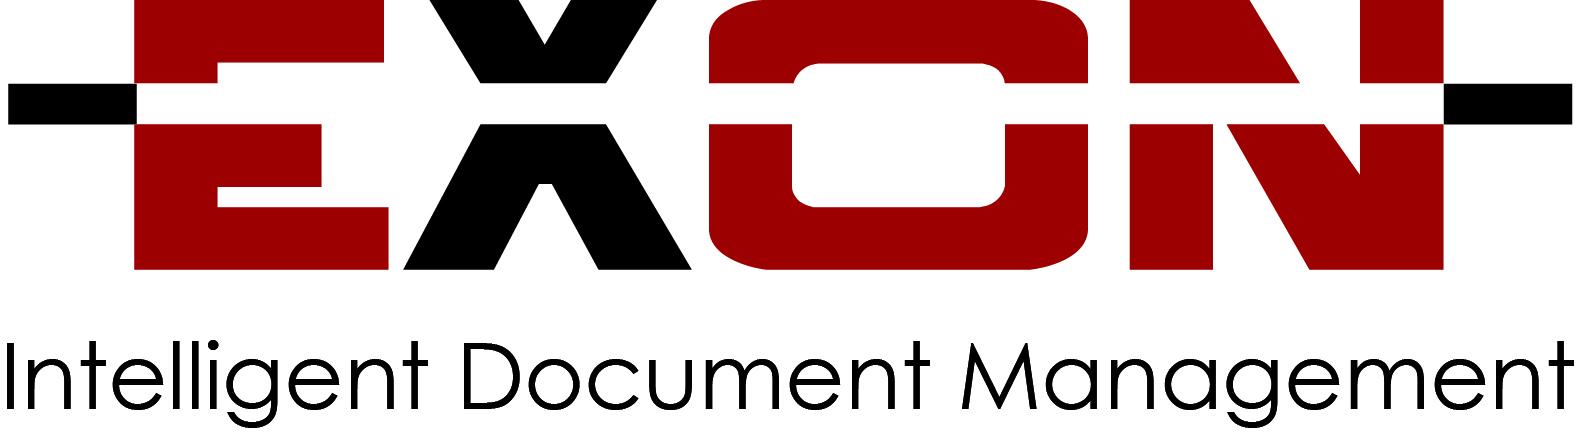 exon-logo-formát-JPG.jpg